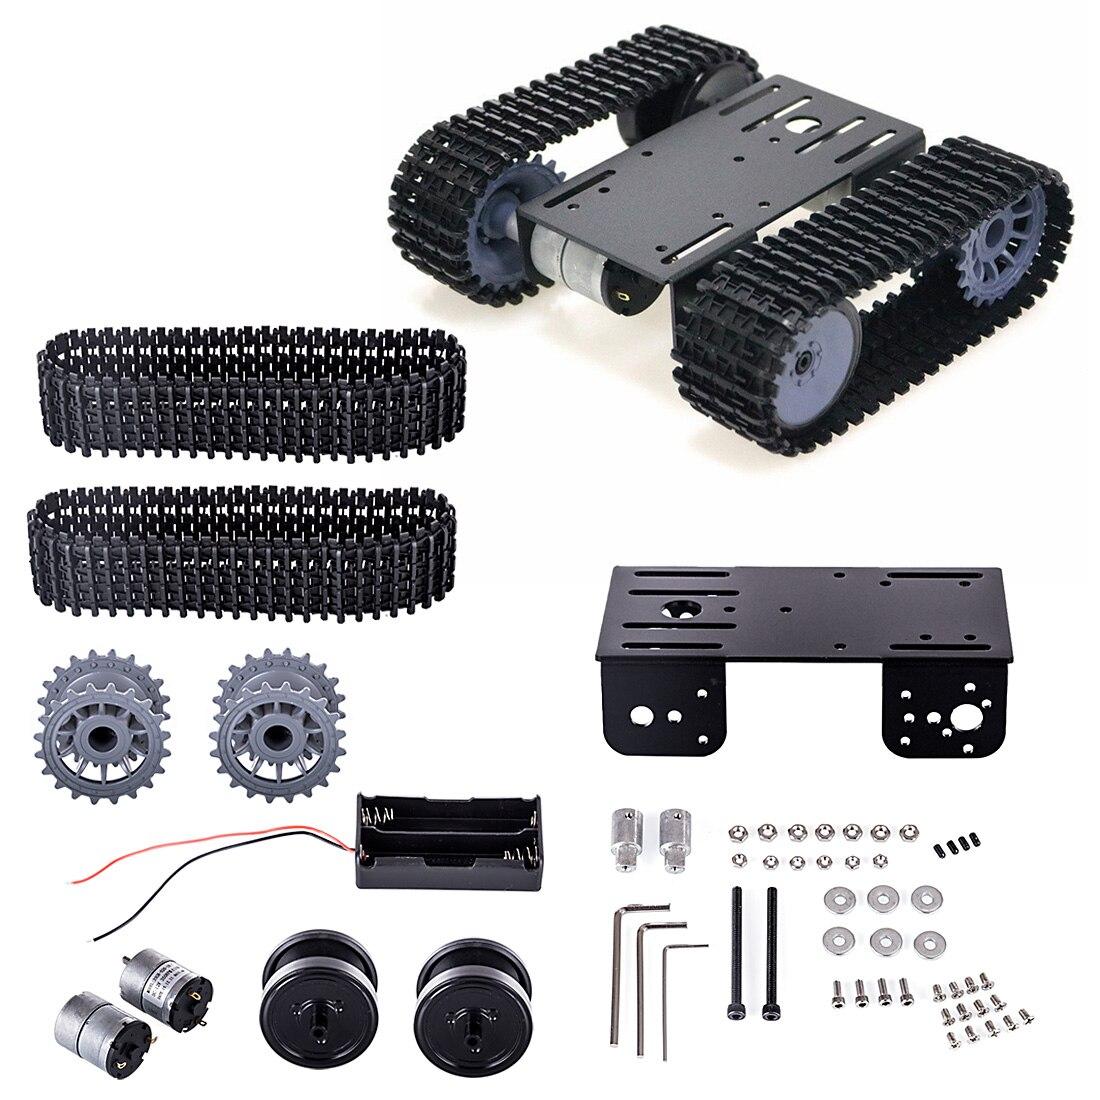 TP101 Tracked Robot Smart Car Platform DIY Metal Robot Tank Crawler Chassis Platform Kit For Arduino - Black/Blue/White